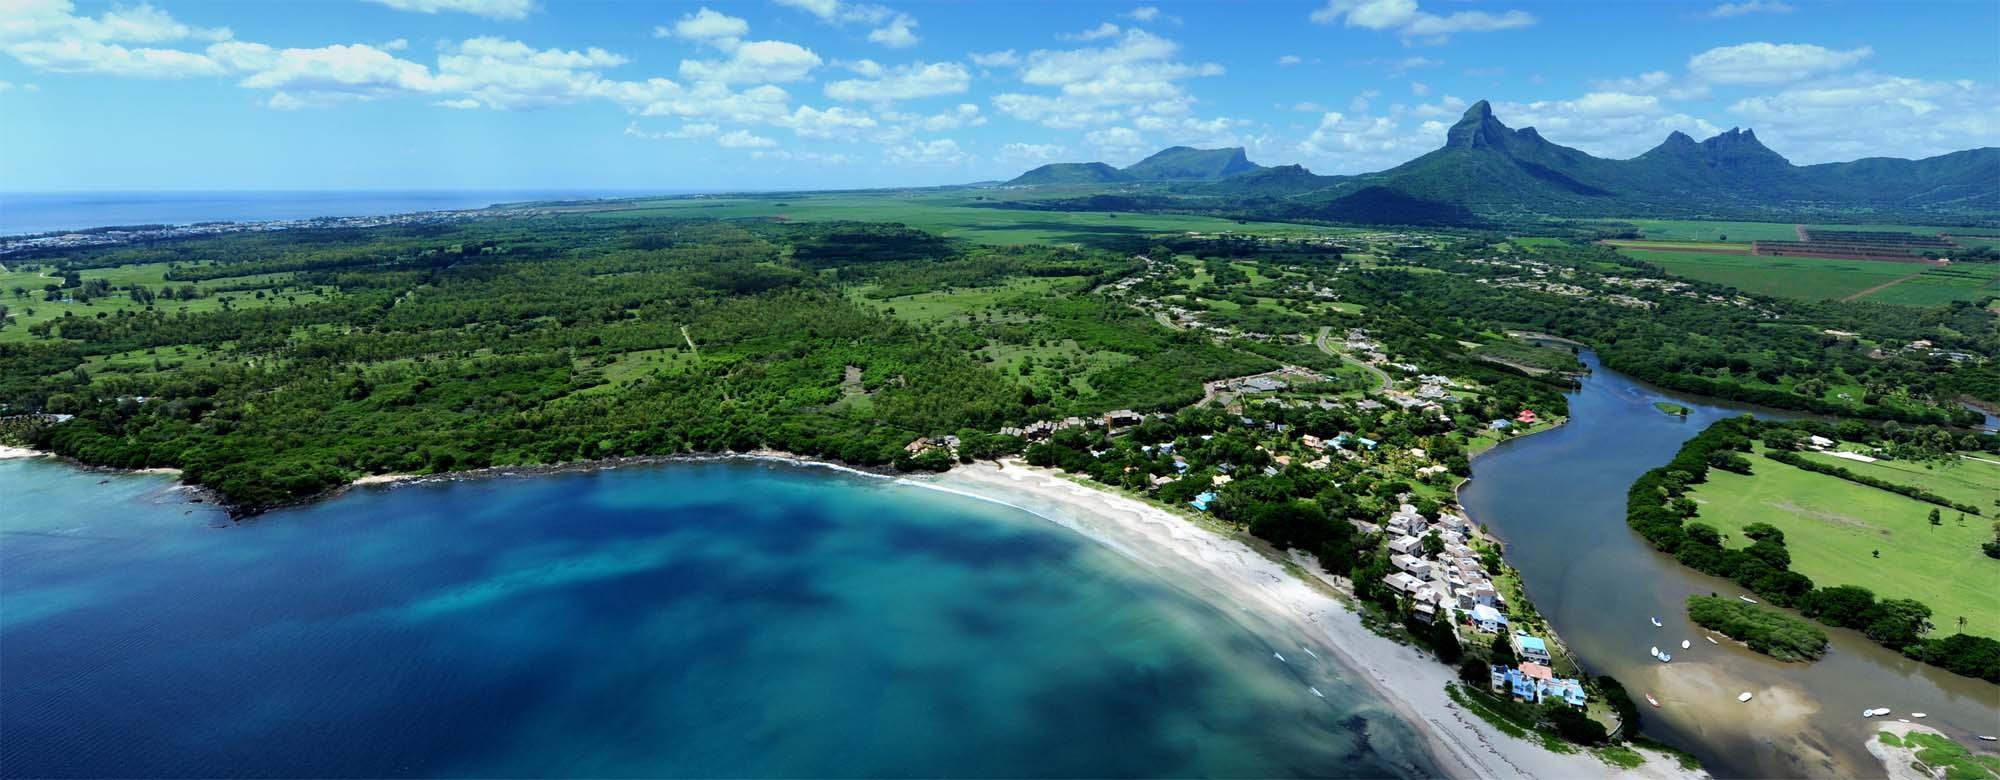 02_PinkPig_Mauritius_HR